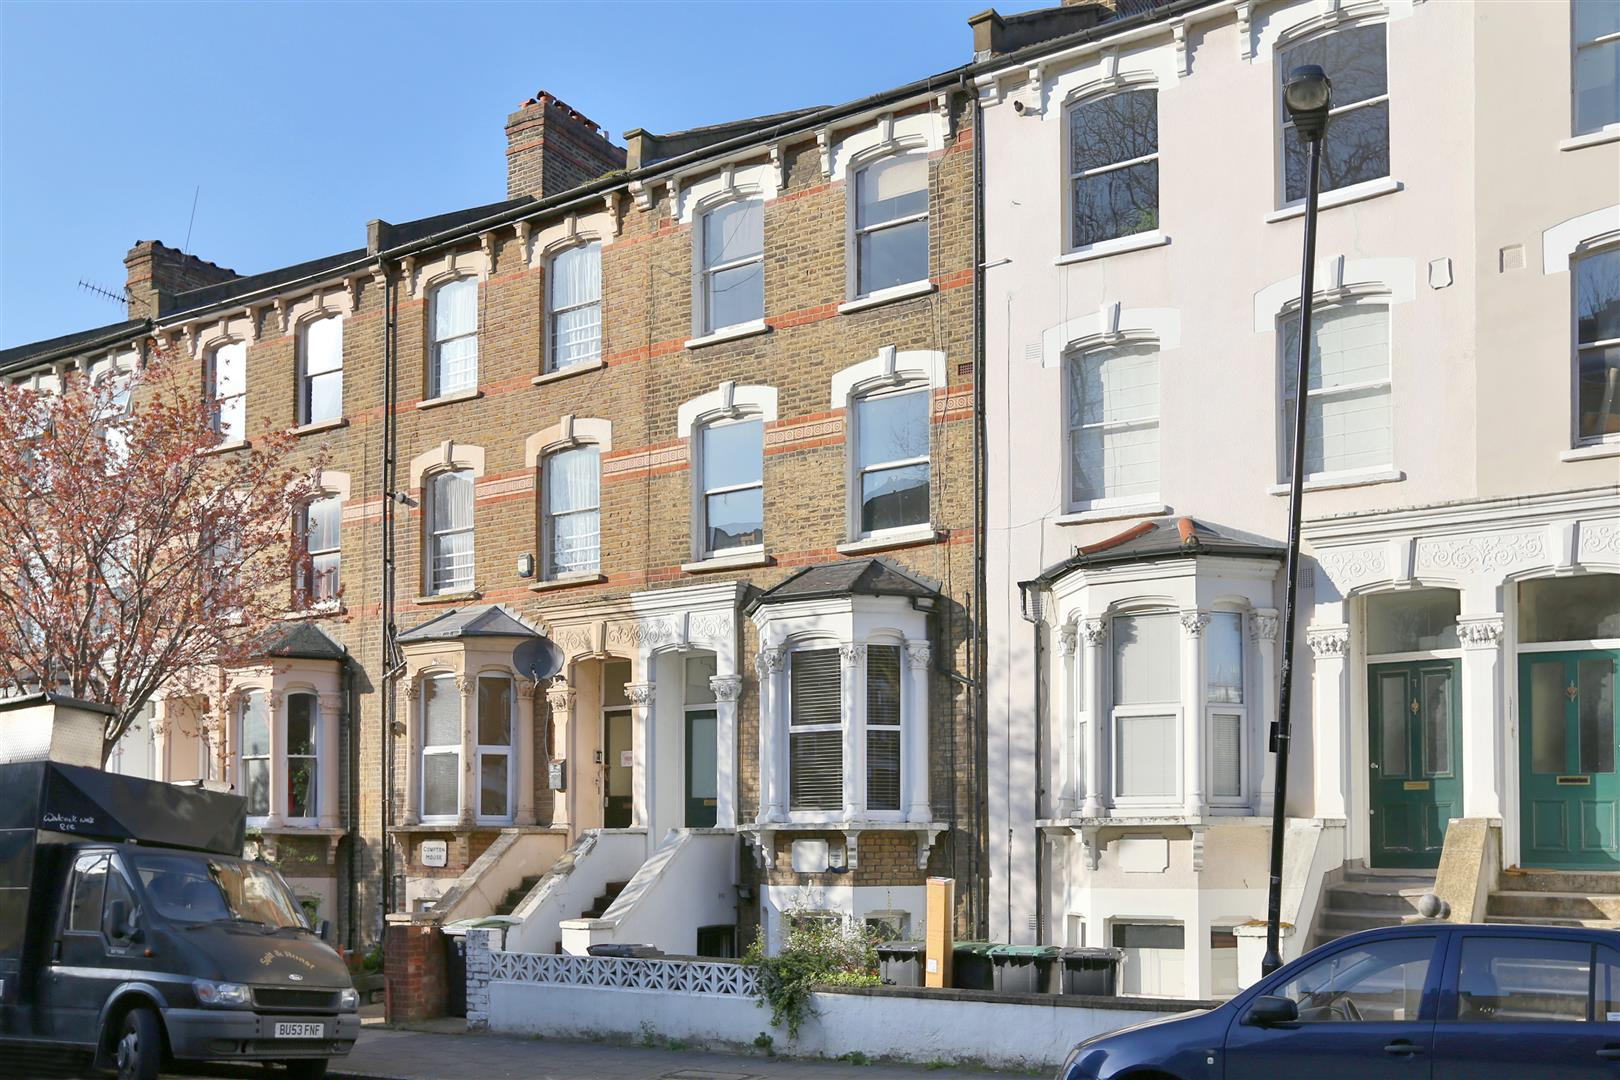 3 Bedrooms Flat for sale in Vartry Road, London